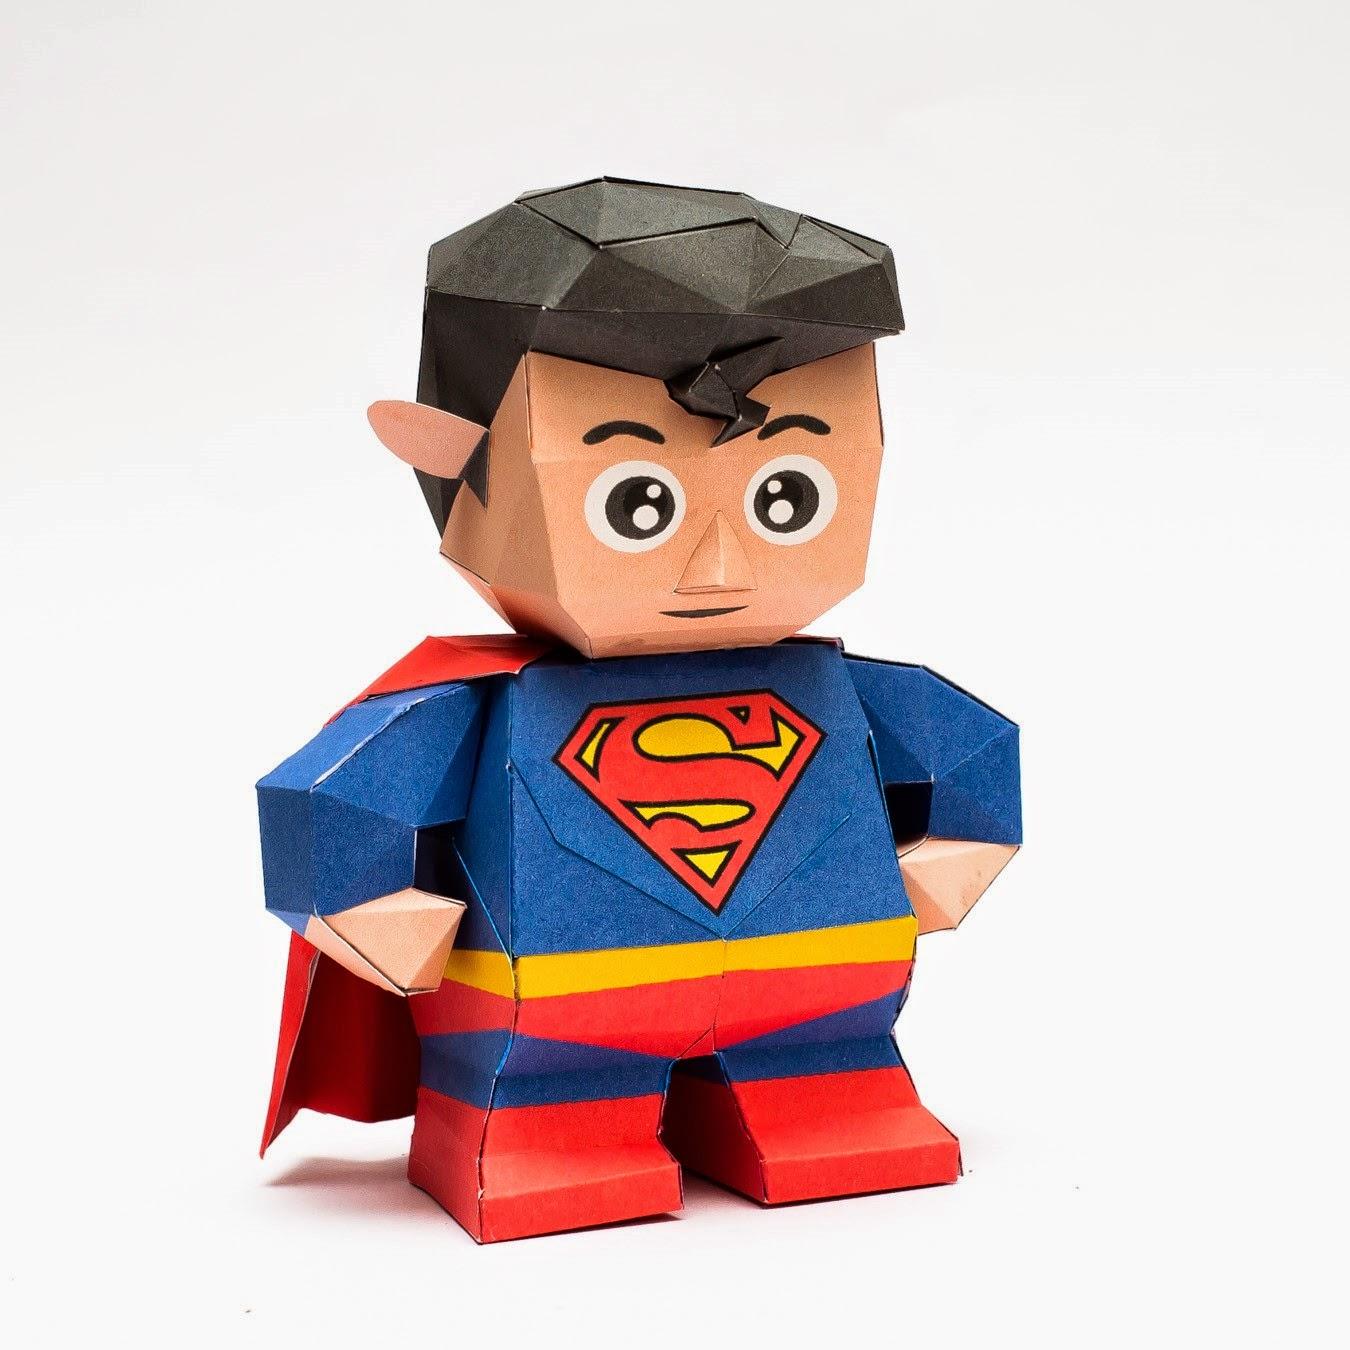 Chibi Superman Papercraft Model